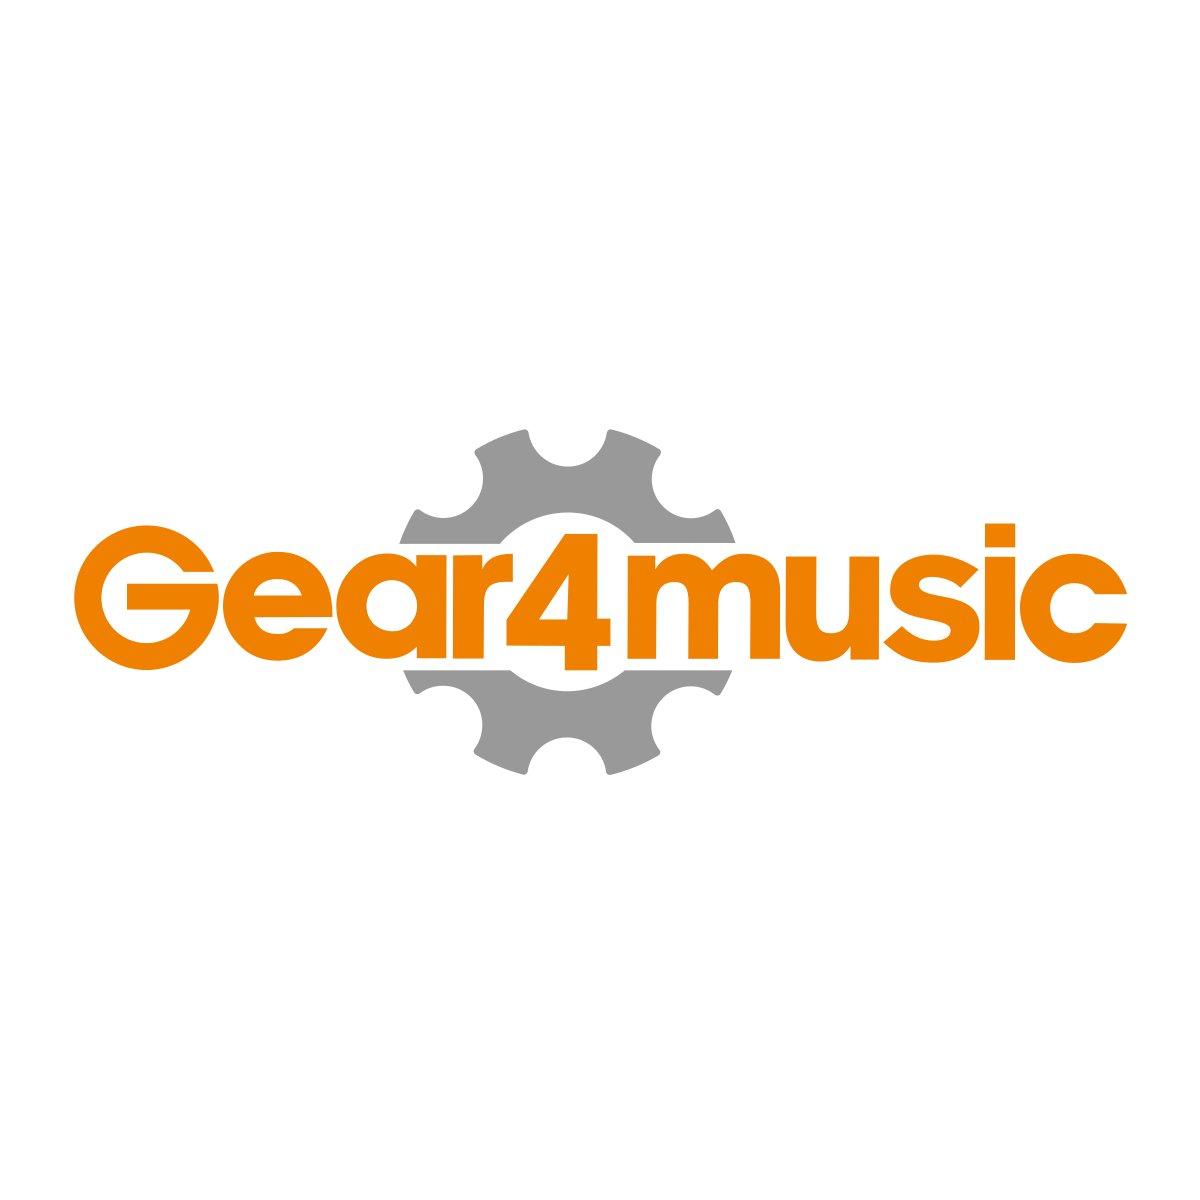 Cheap Classical Guitar by Gear4music, Natural